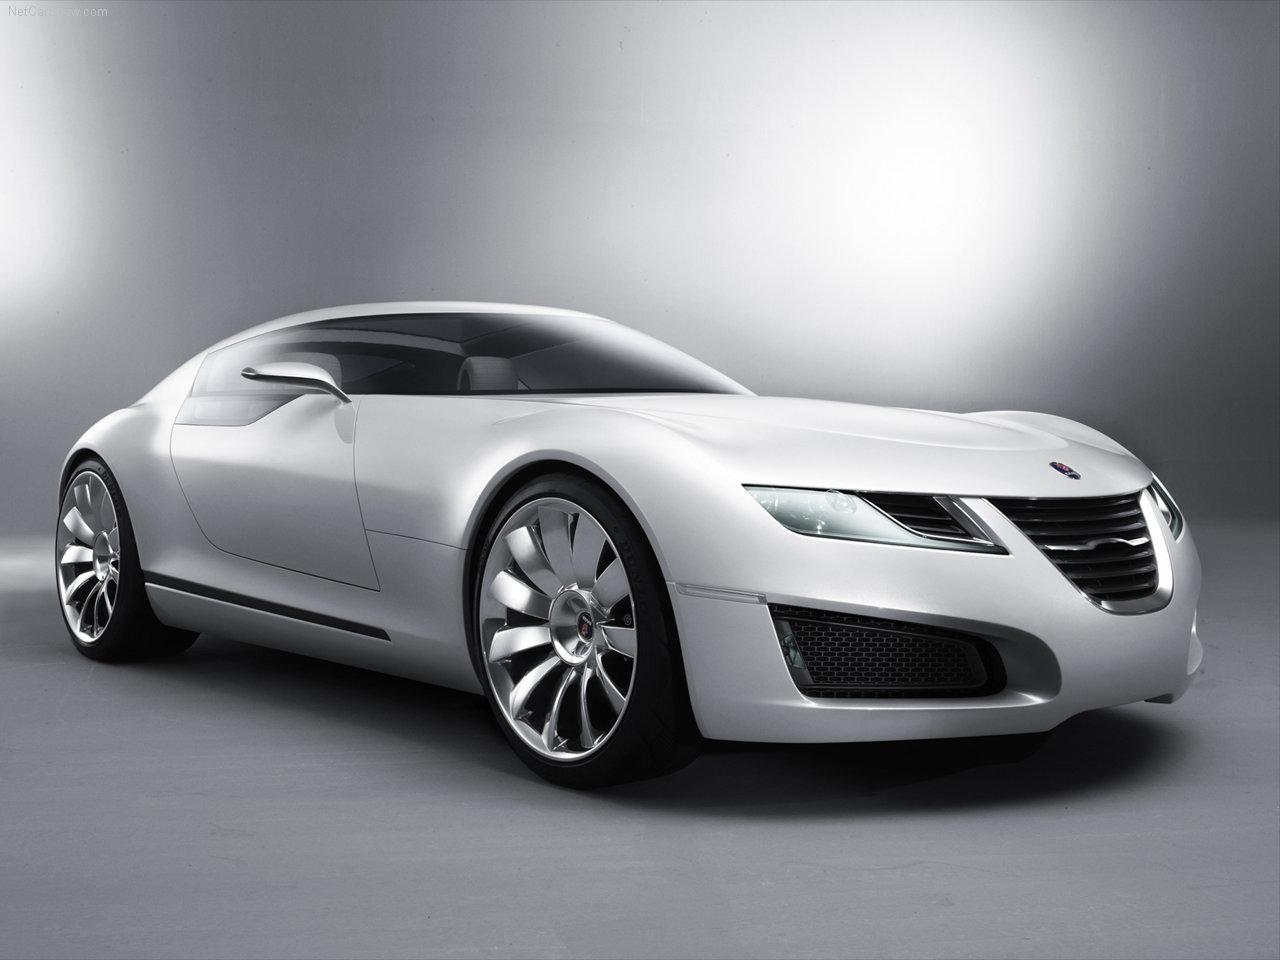 2006_Saab_Aero_X_Concept_1280x960_02.jpg